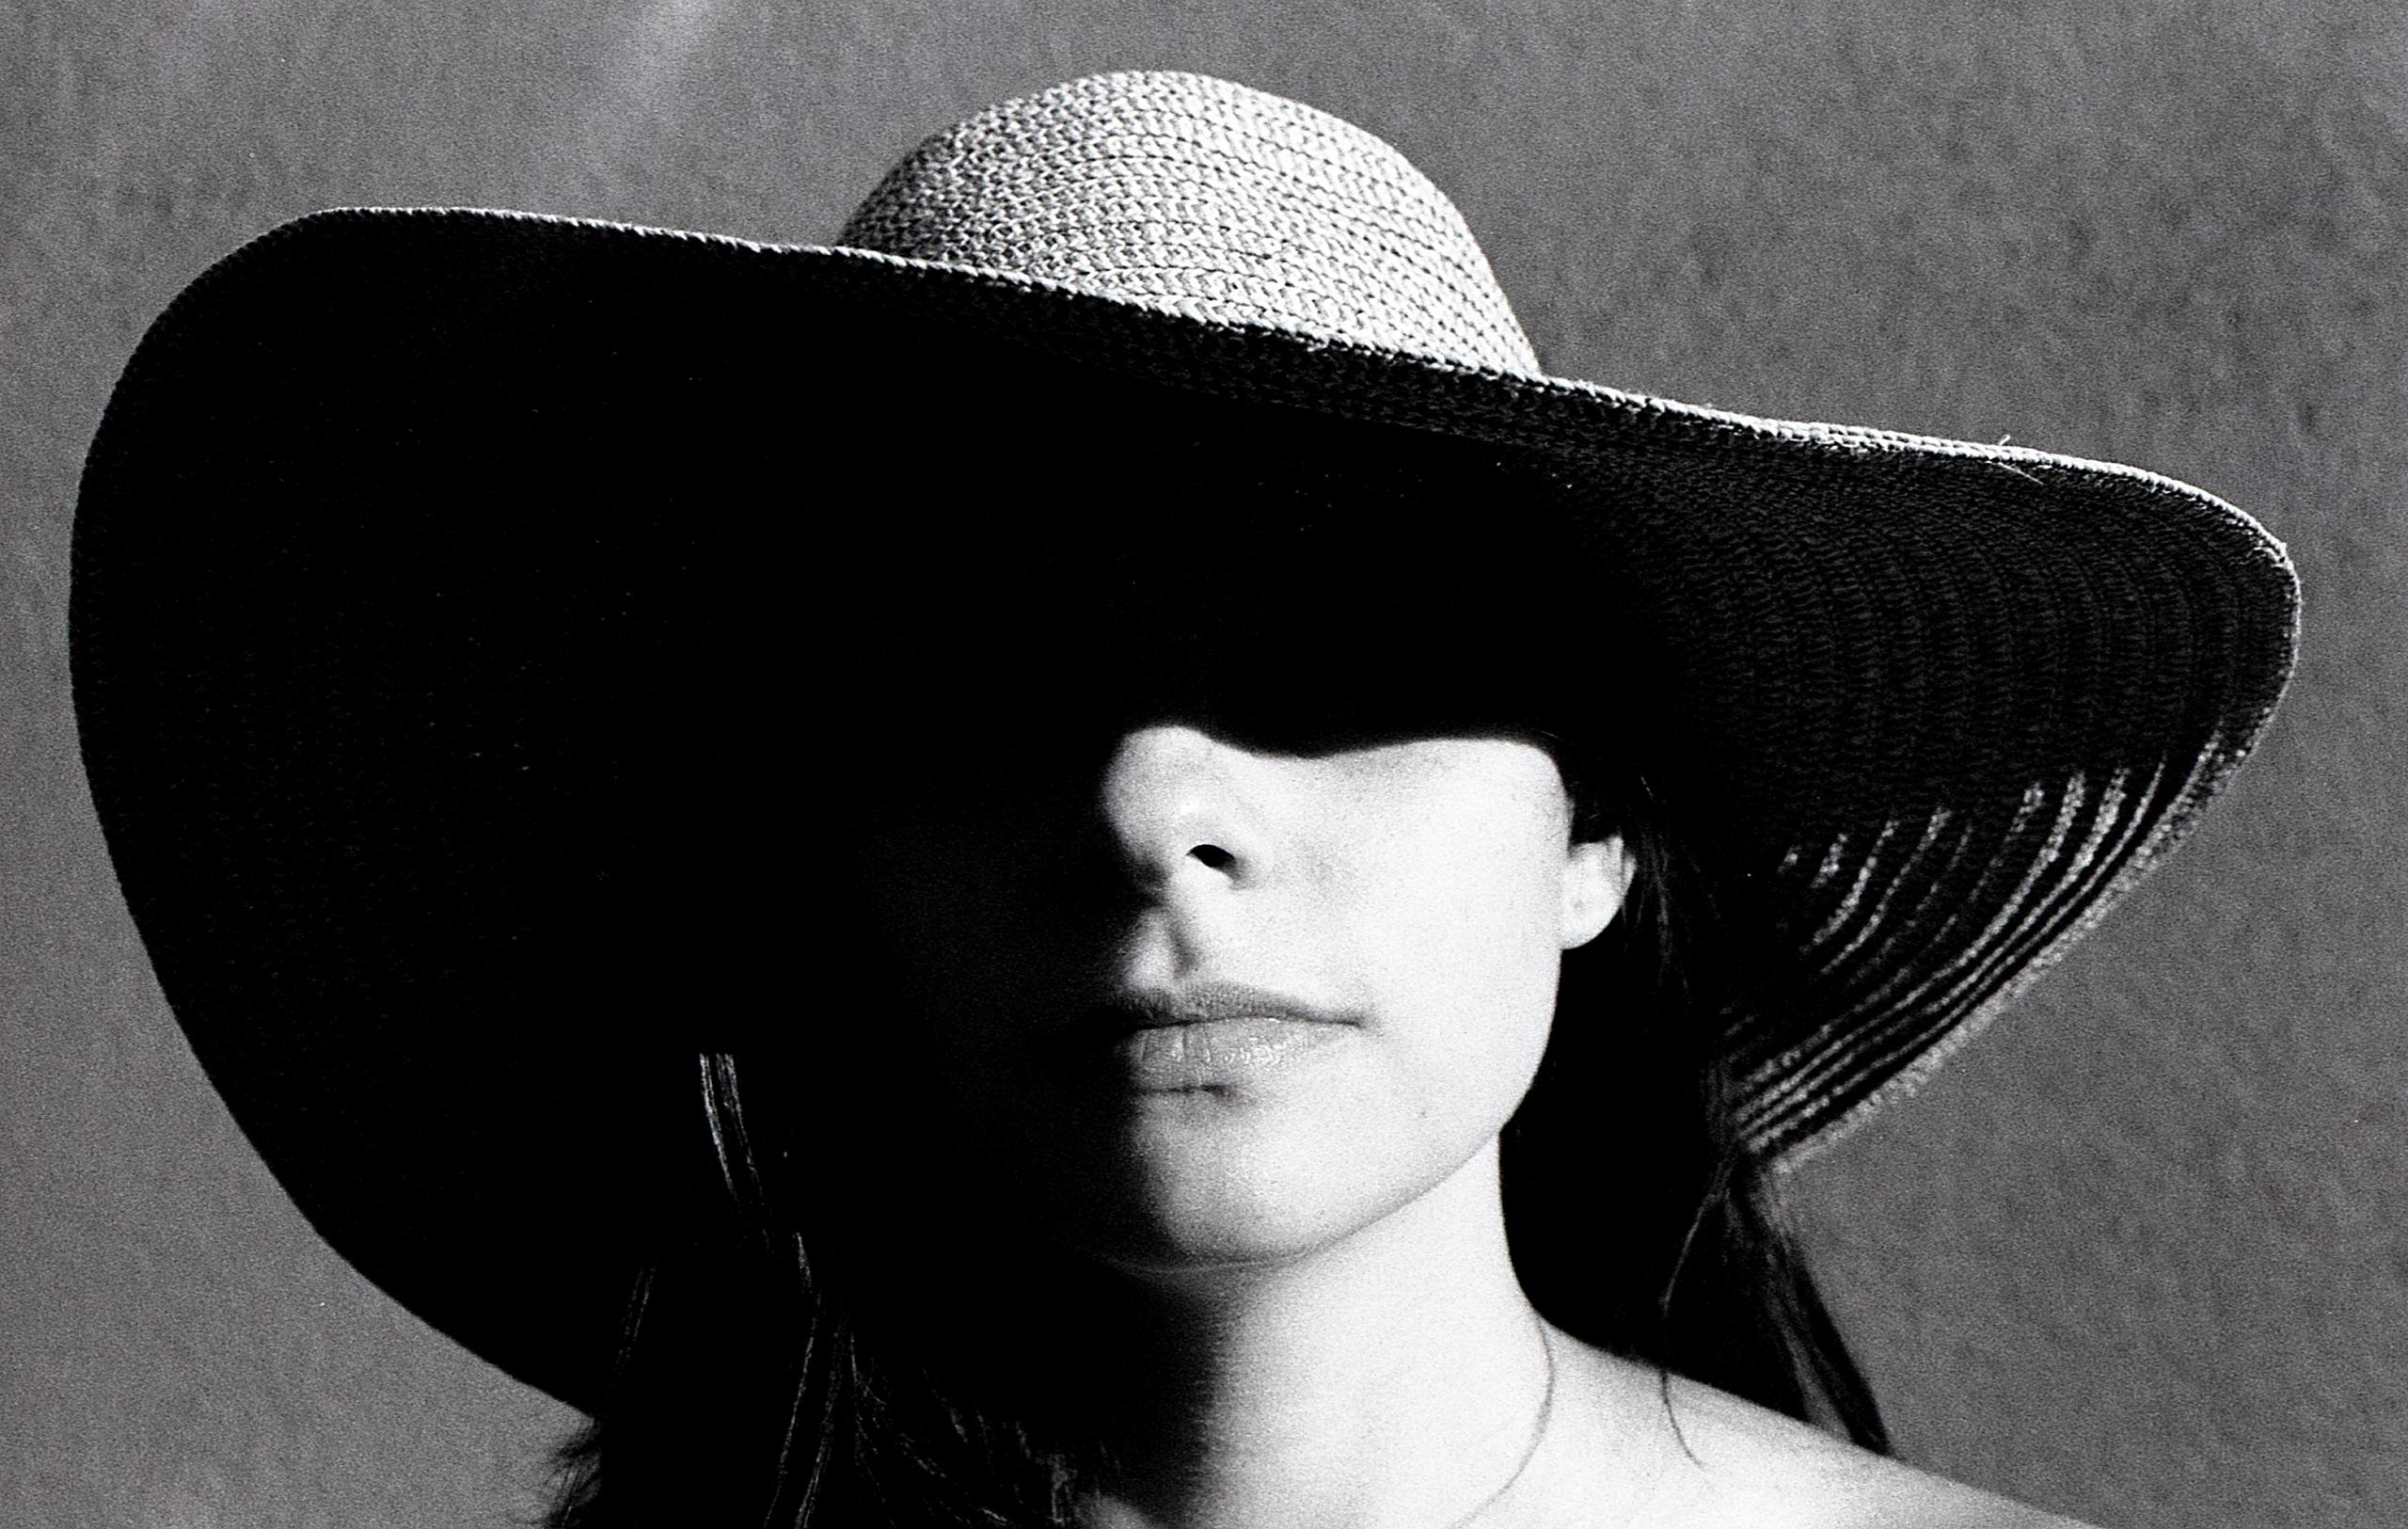 Noir - film, beregger, pancro, portrait - ekoshyk | ello